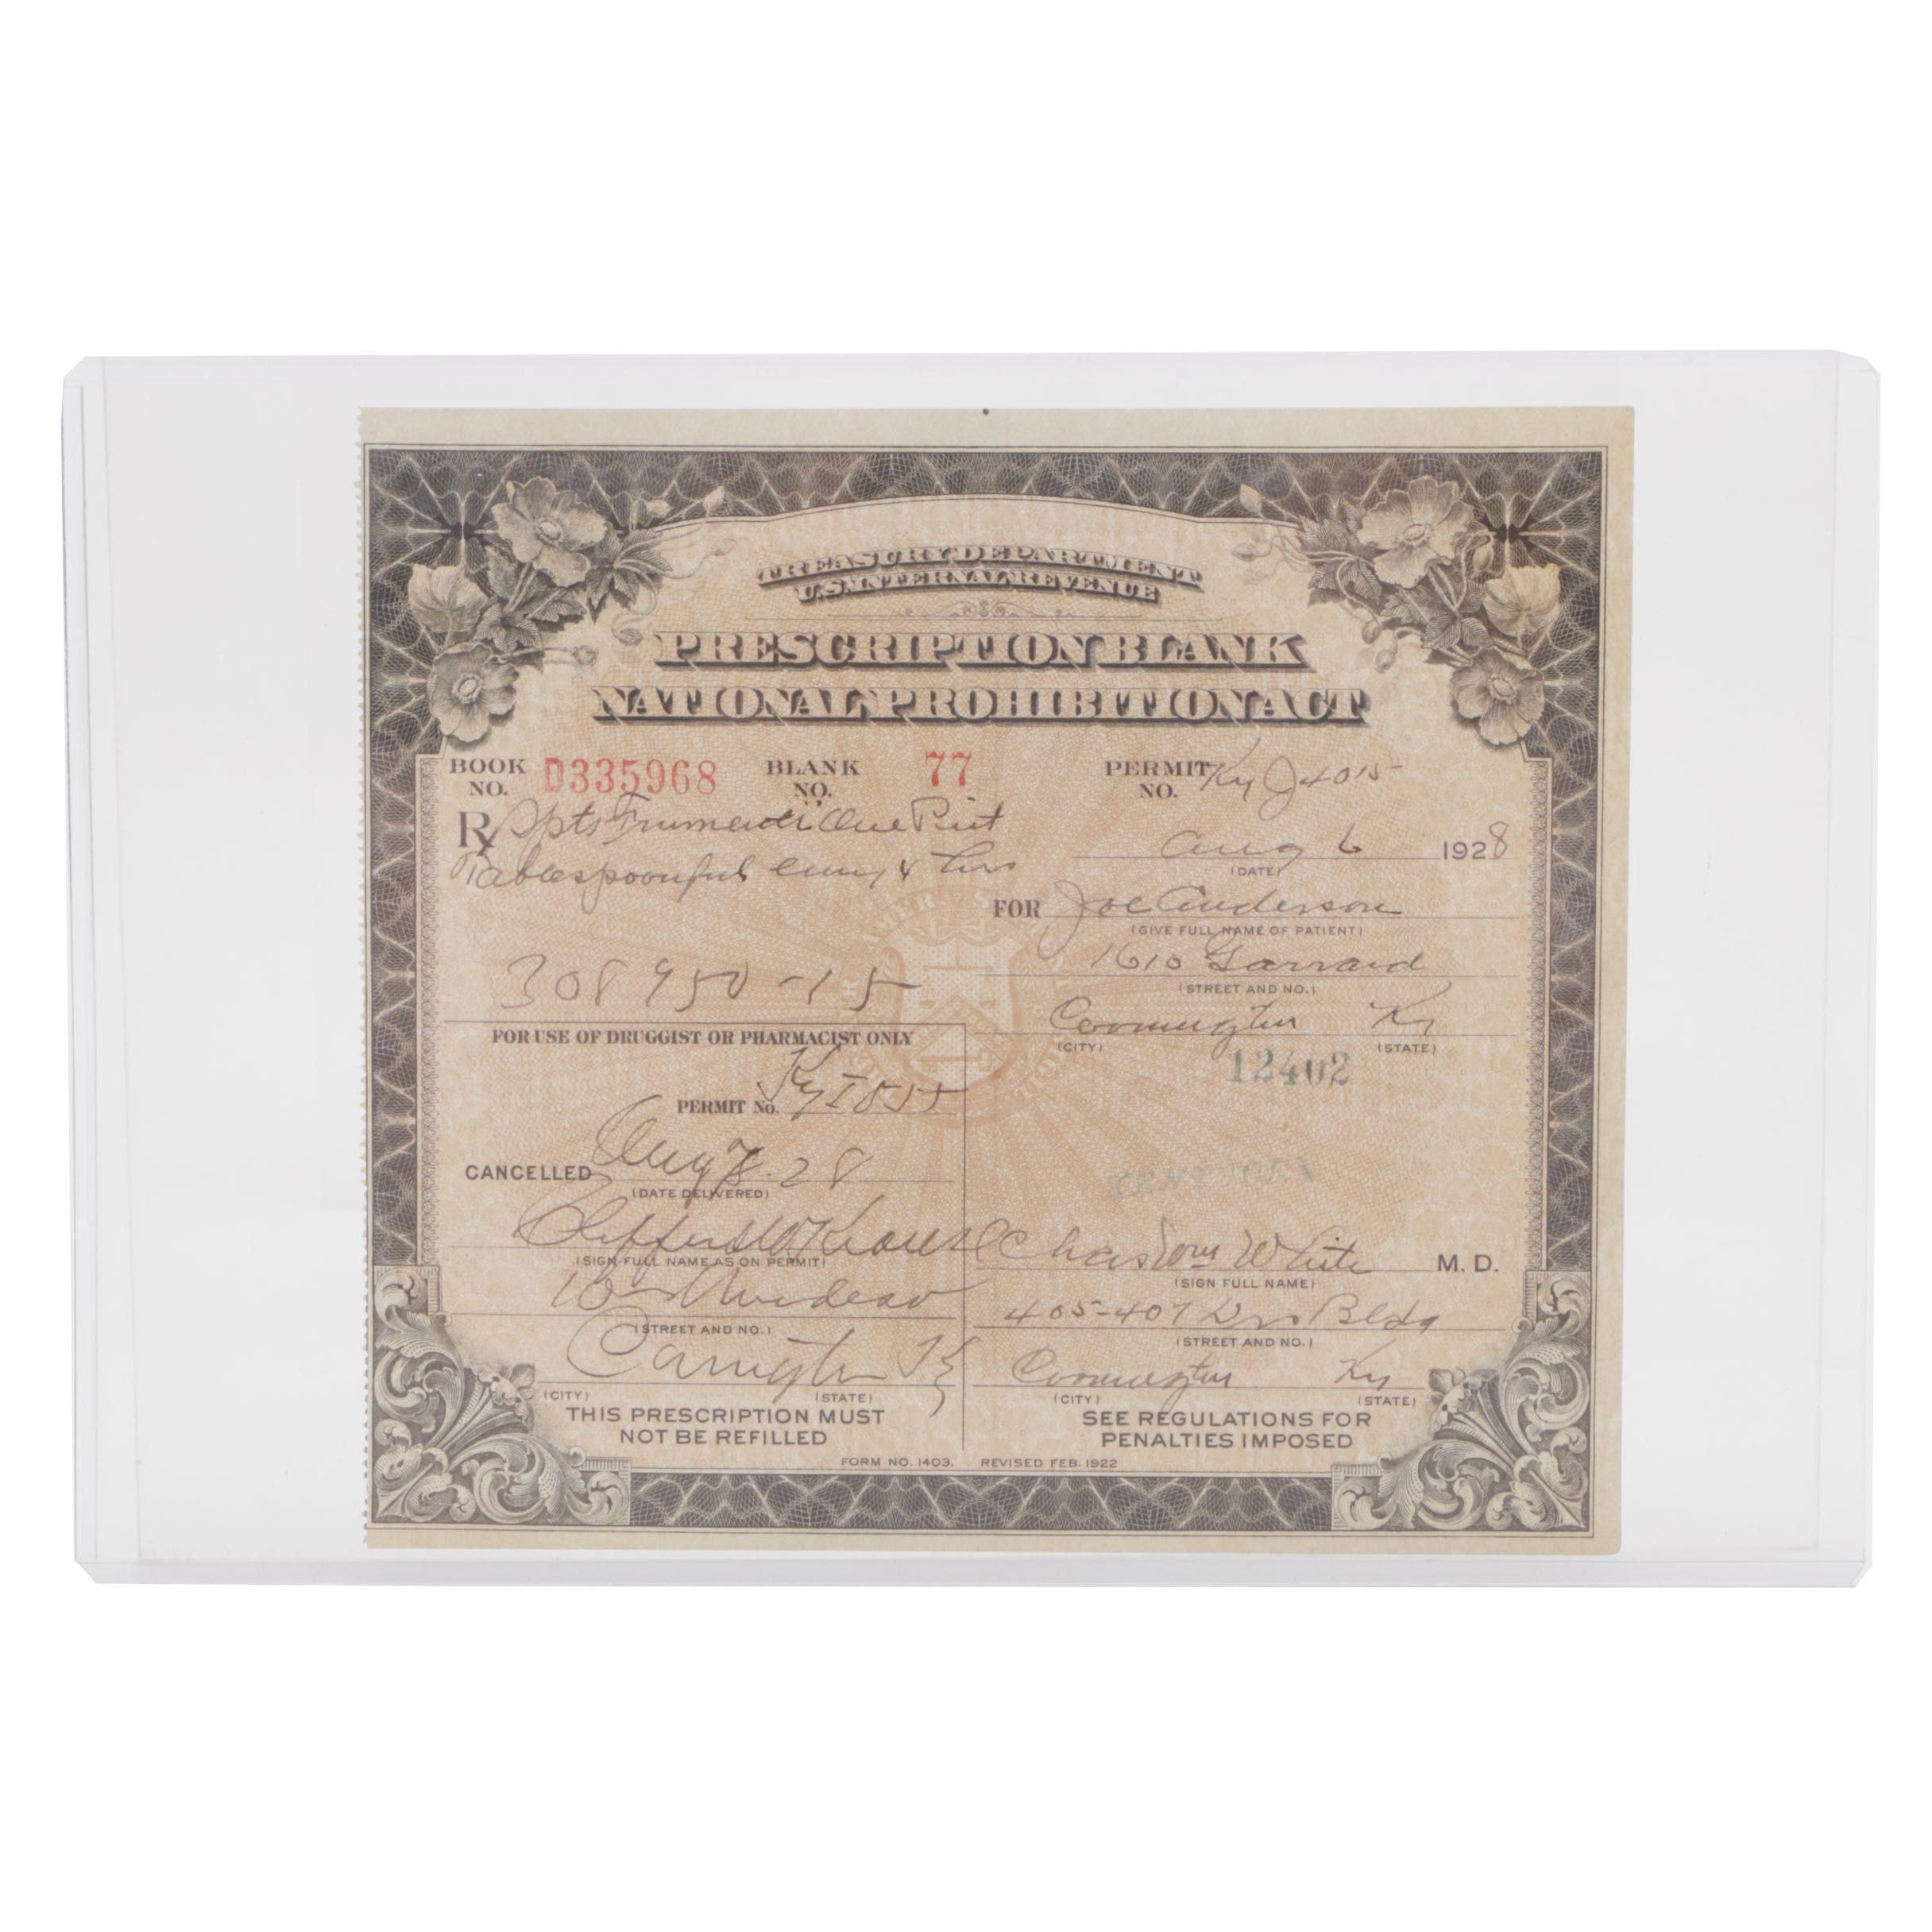 1928 Prohibition Era Alcohol Prescription from Kentucky